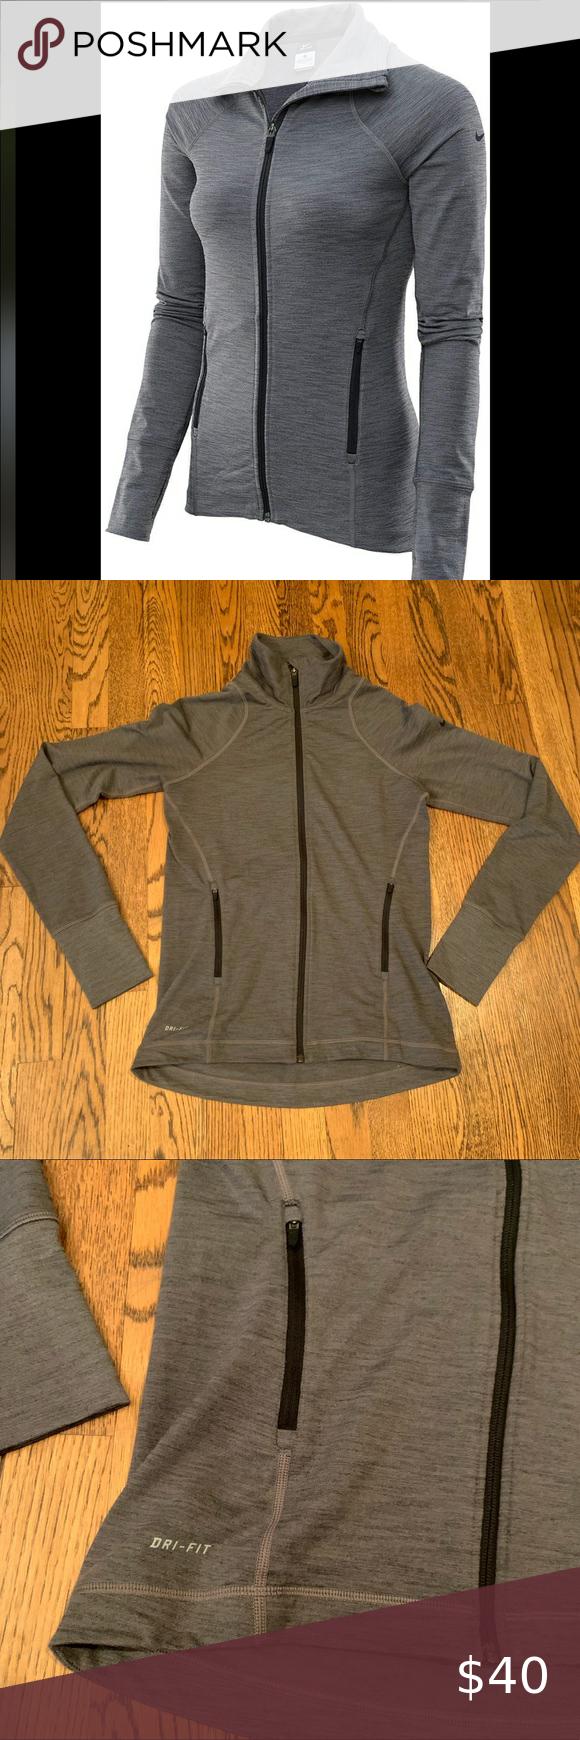 Orgulloso esperanza conveniencia  Nike Legend 2.0 Dri-Fit Poly running Jacket Med   Running jacket, Sleek  fashion, Jackets